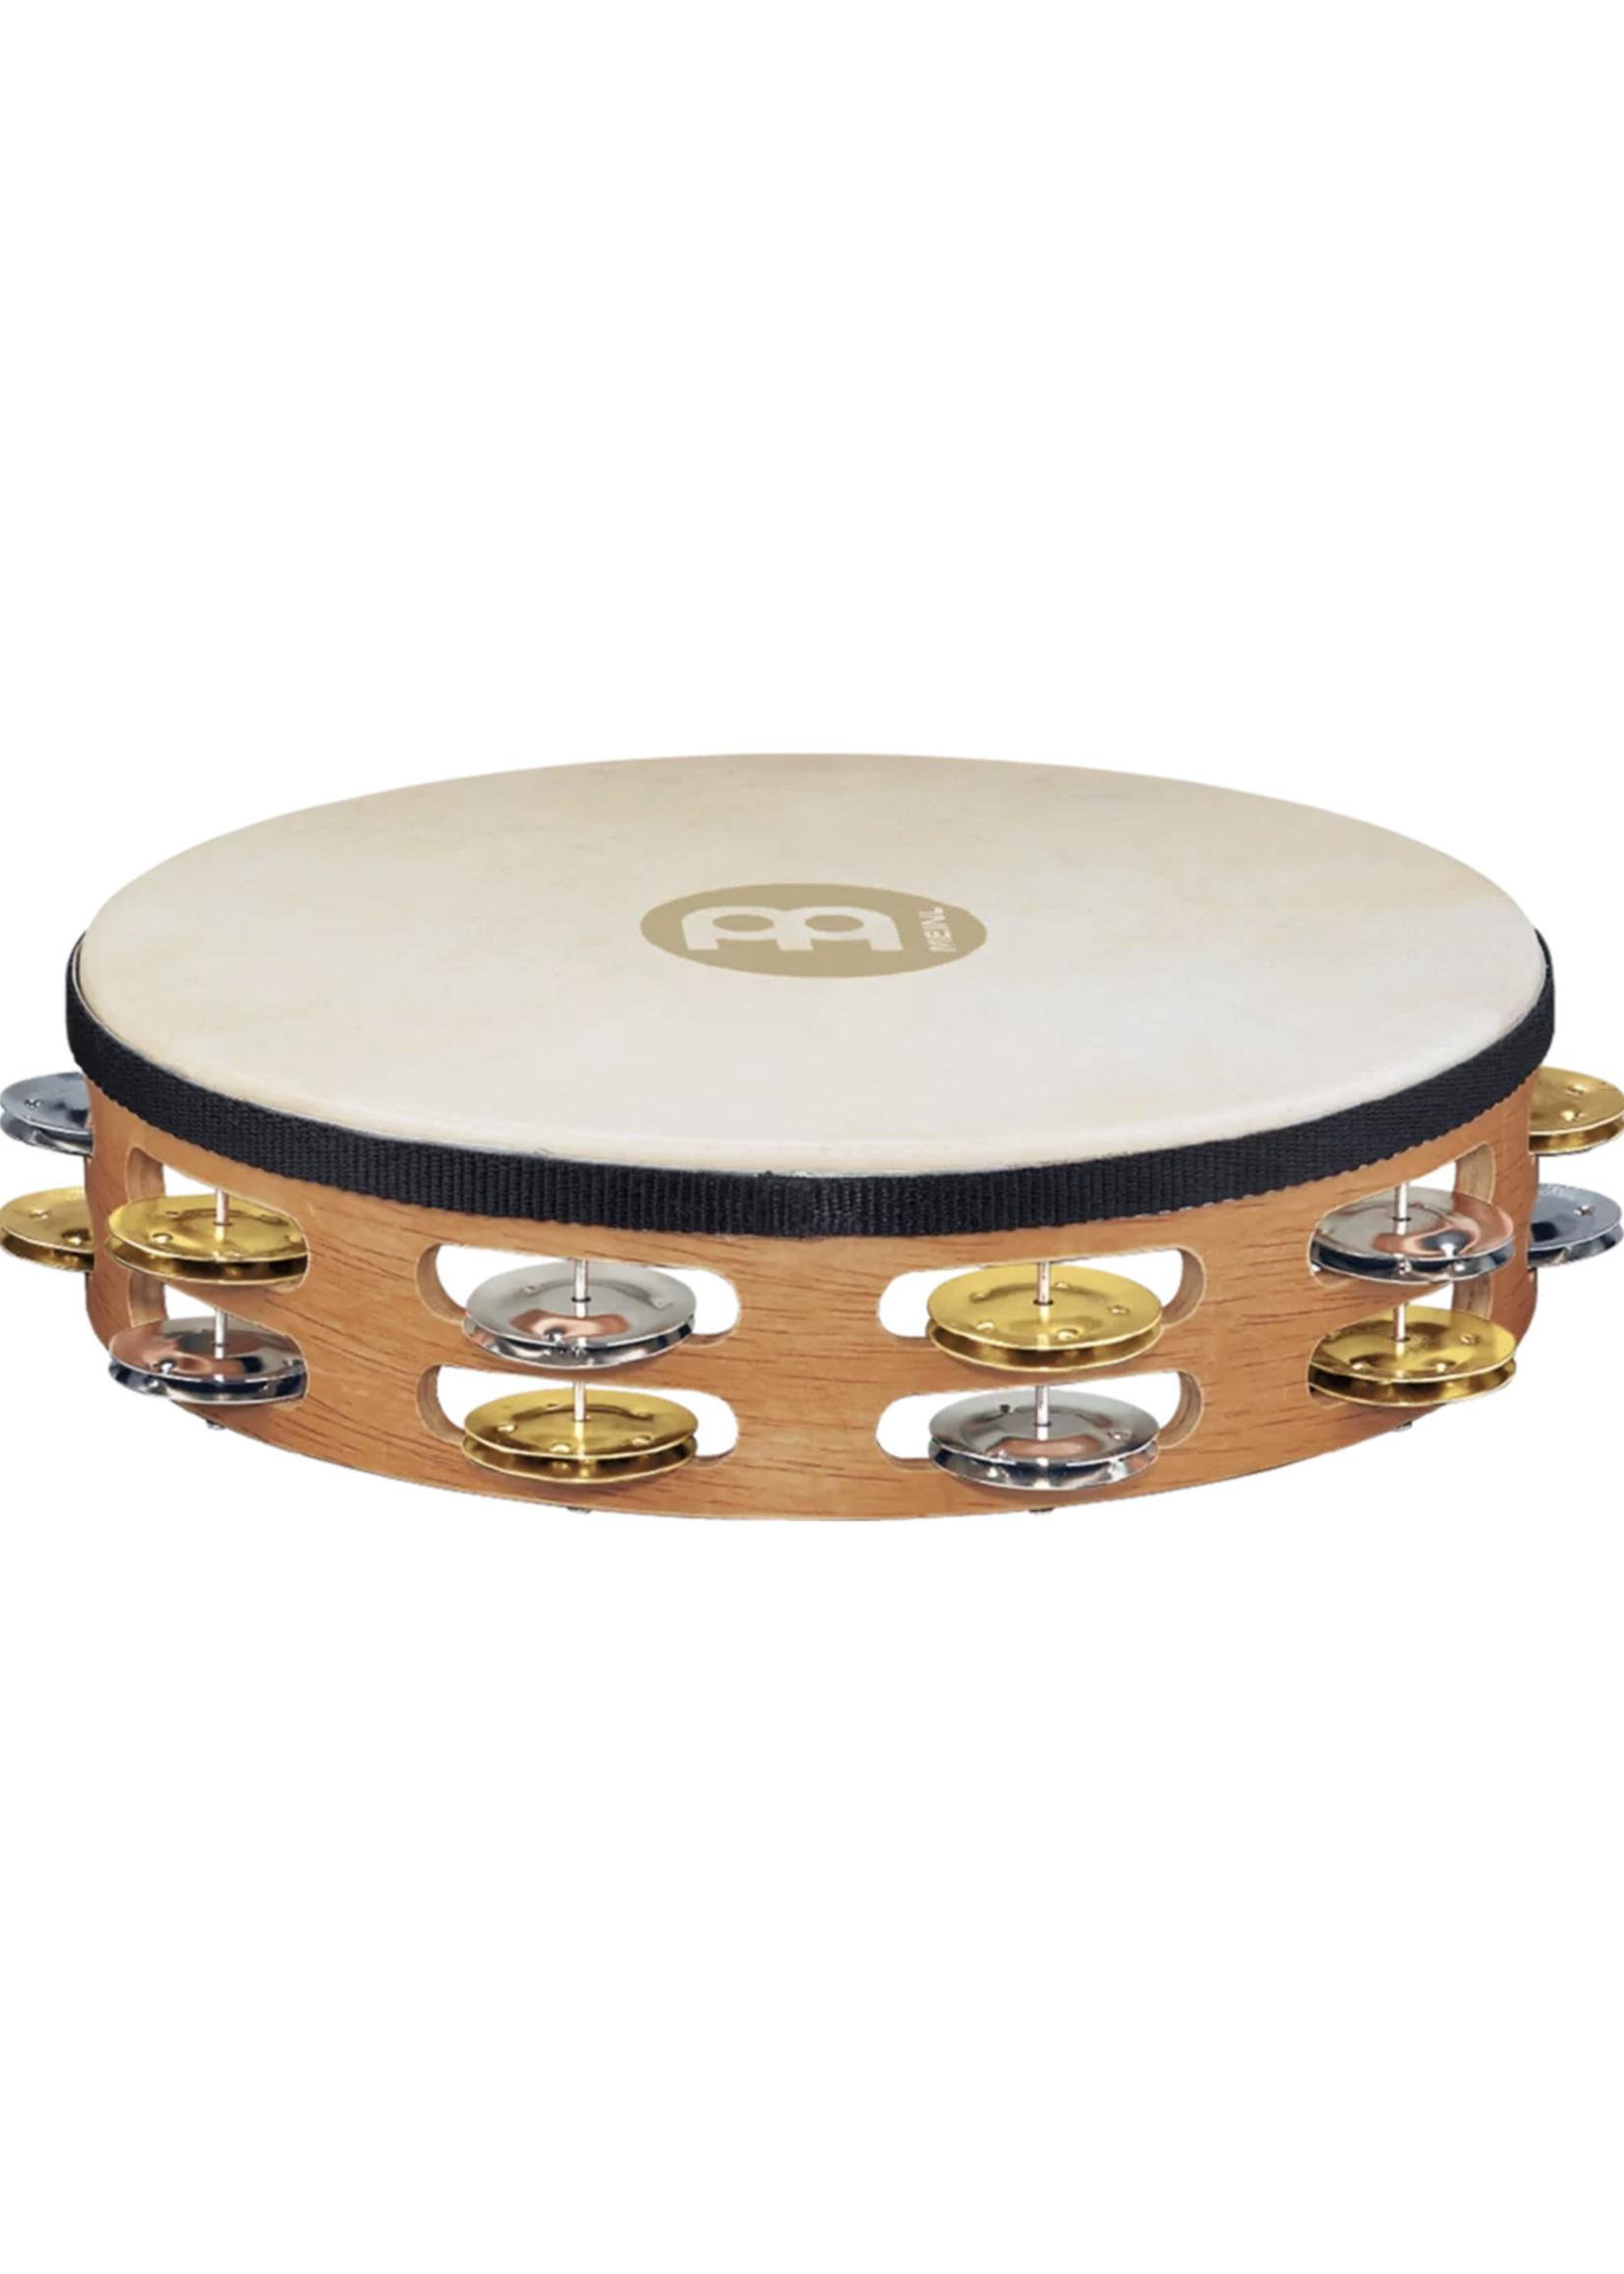 Meinl Headed Tambourine Dual alloy jingles Super Natural